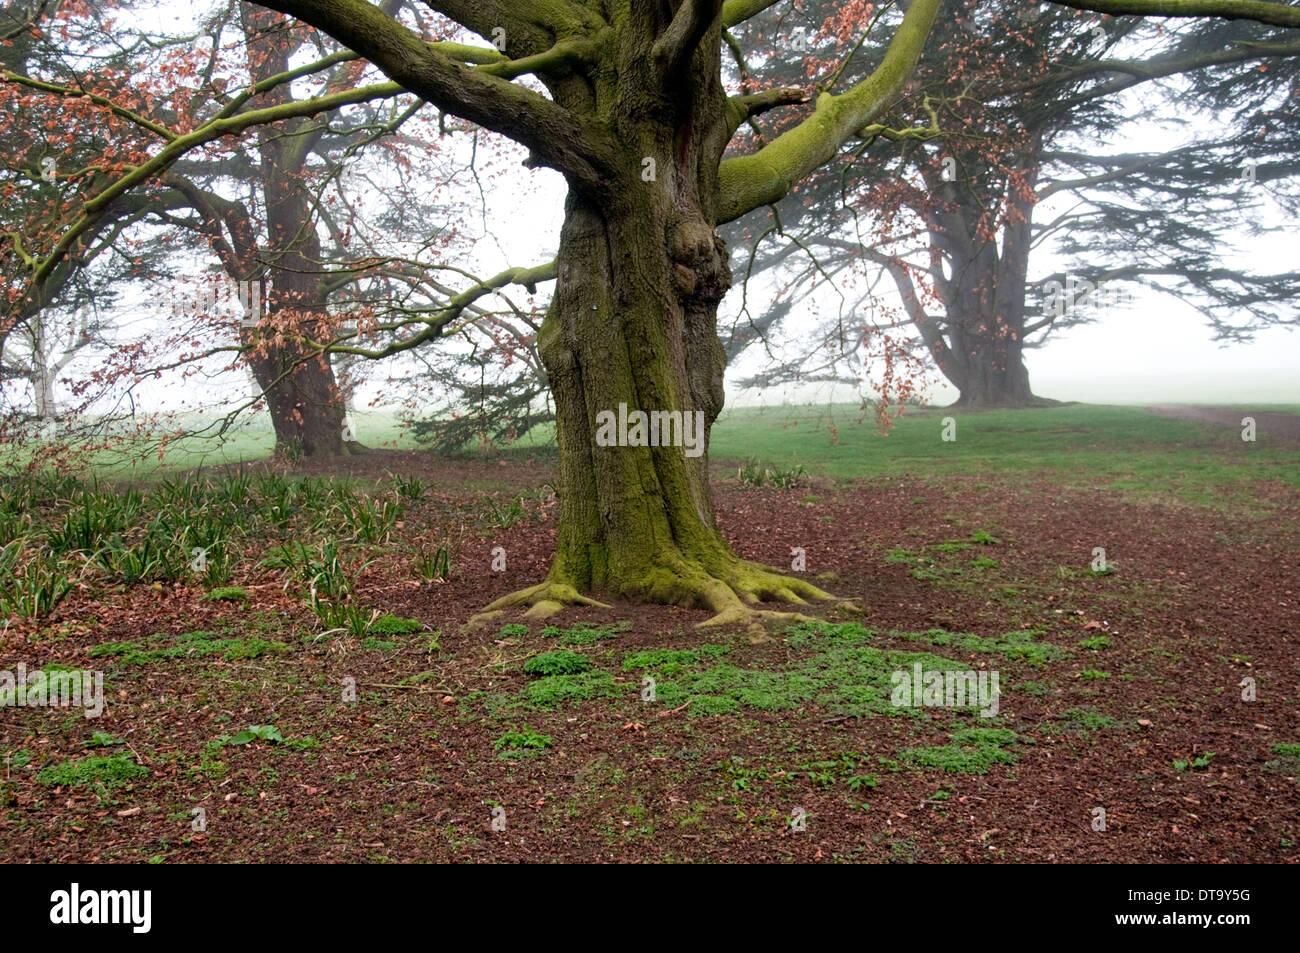 University Parks Tree, Oxford, UK. - Stock Image